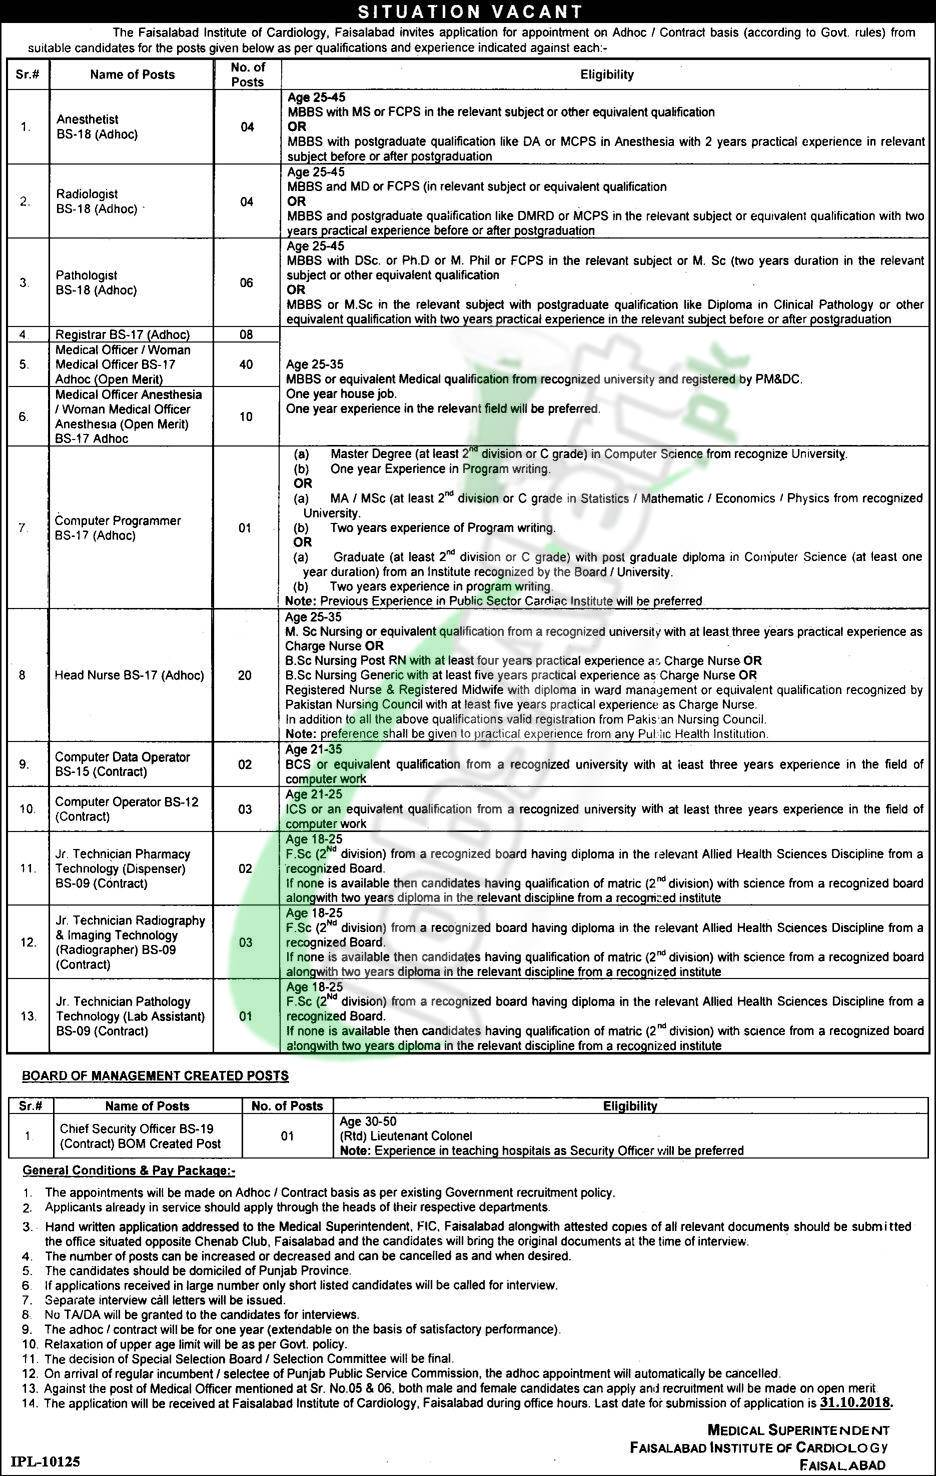 FIC Faisalabad Jobs